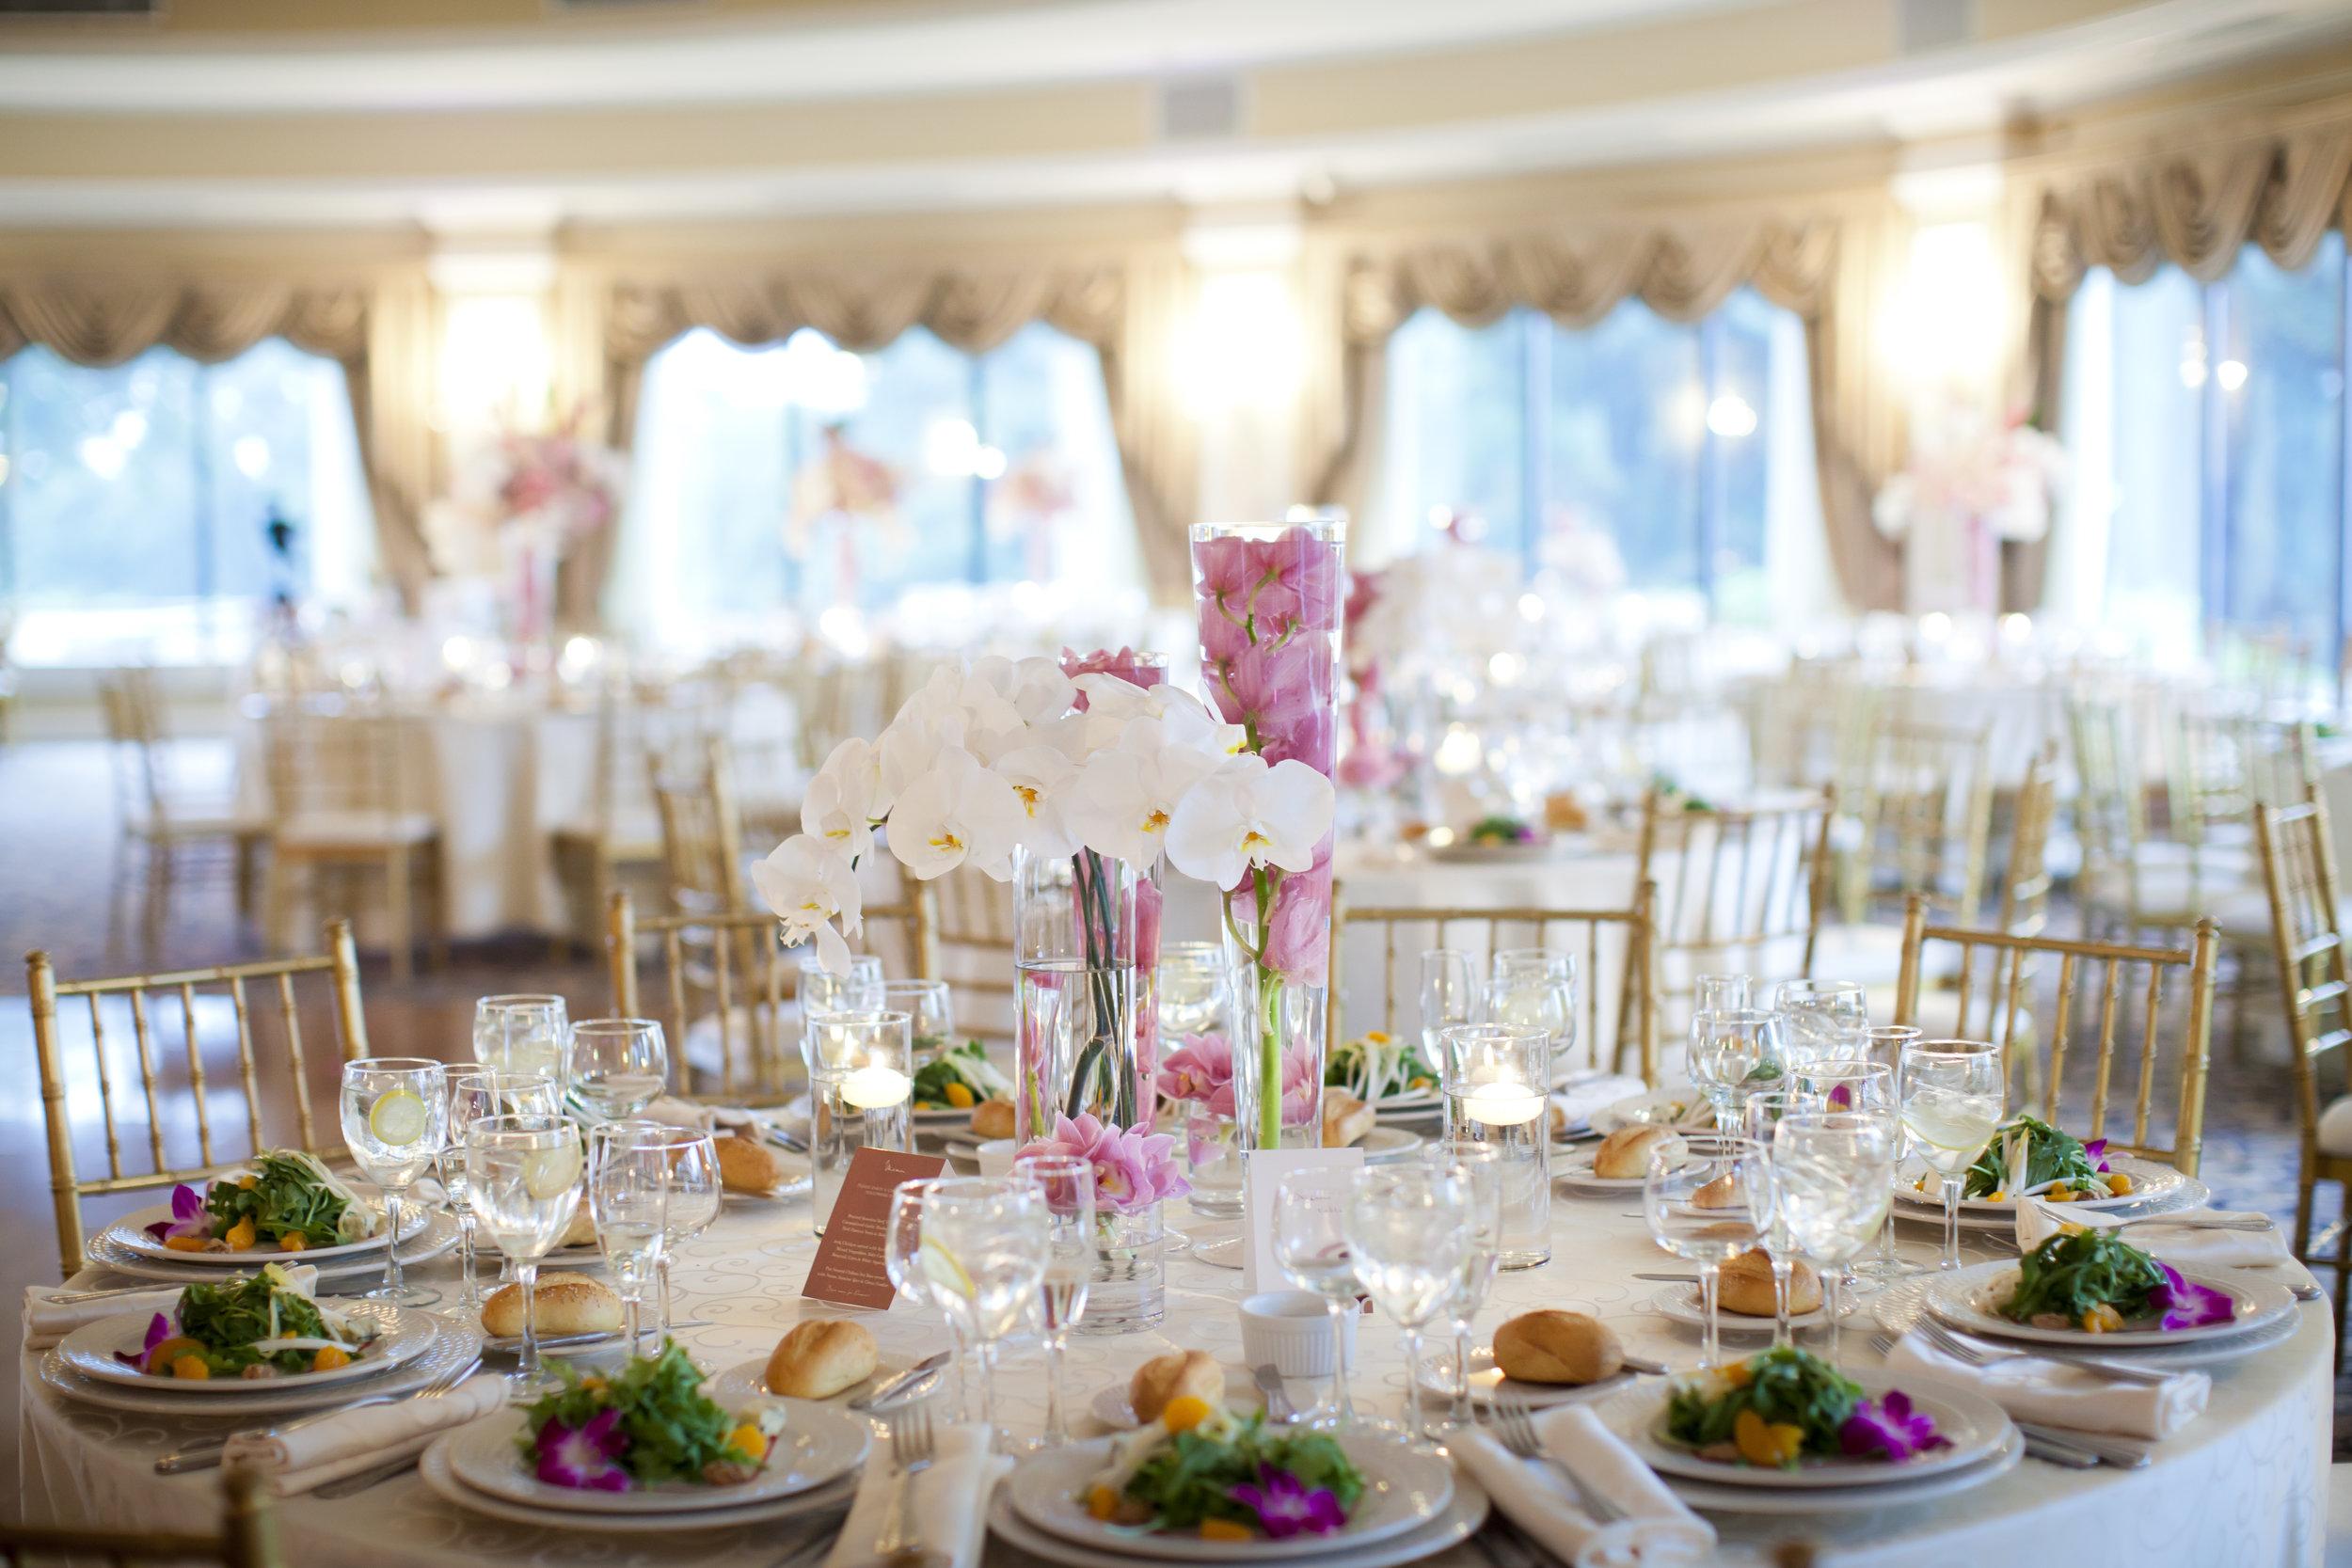 Pink+and+White+Wedding+Centerpieces+(1).jpg